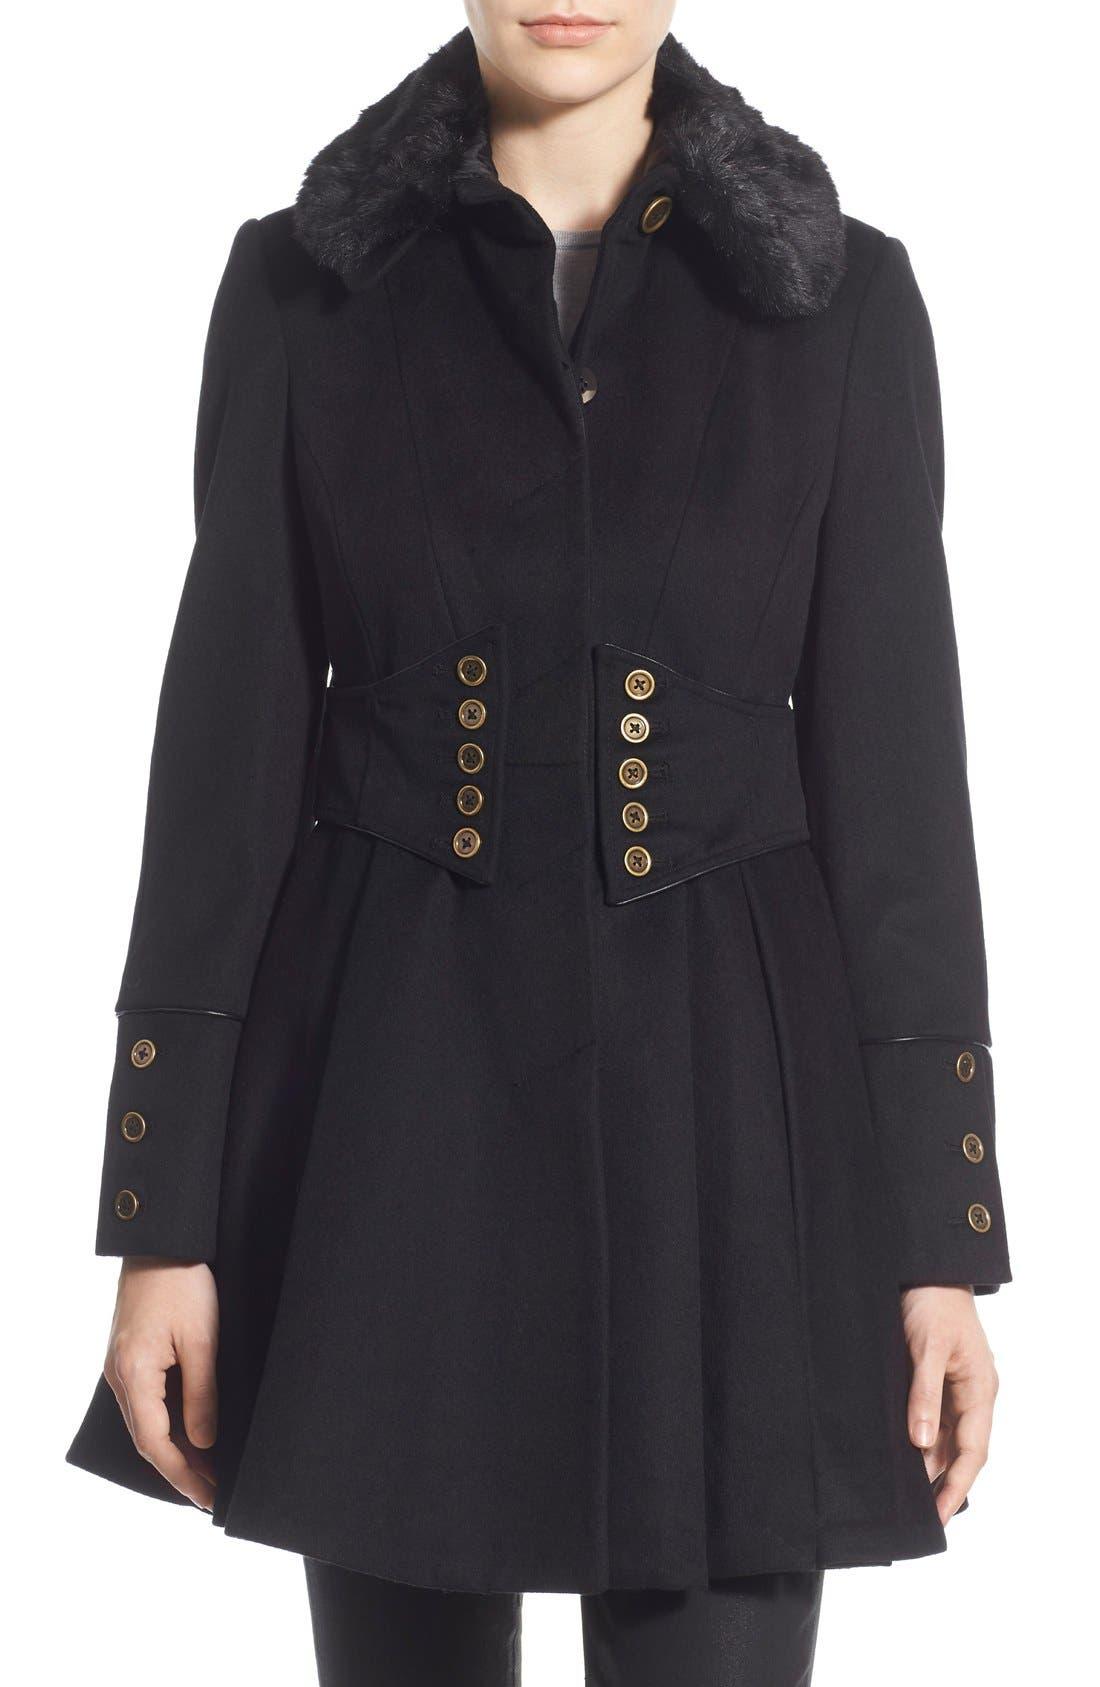 Alternate Image 1 Selected - Betsey Johnson Faux Fur Collar Skirted Wool Blend Coat